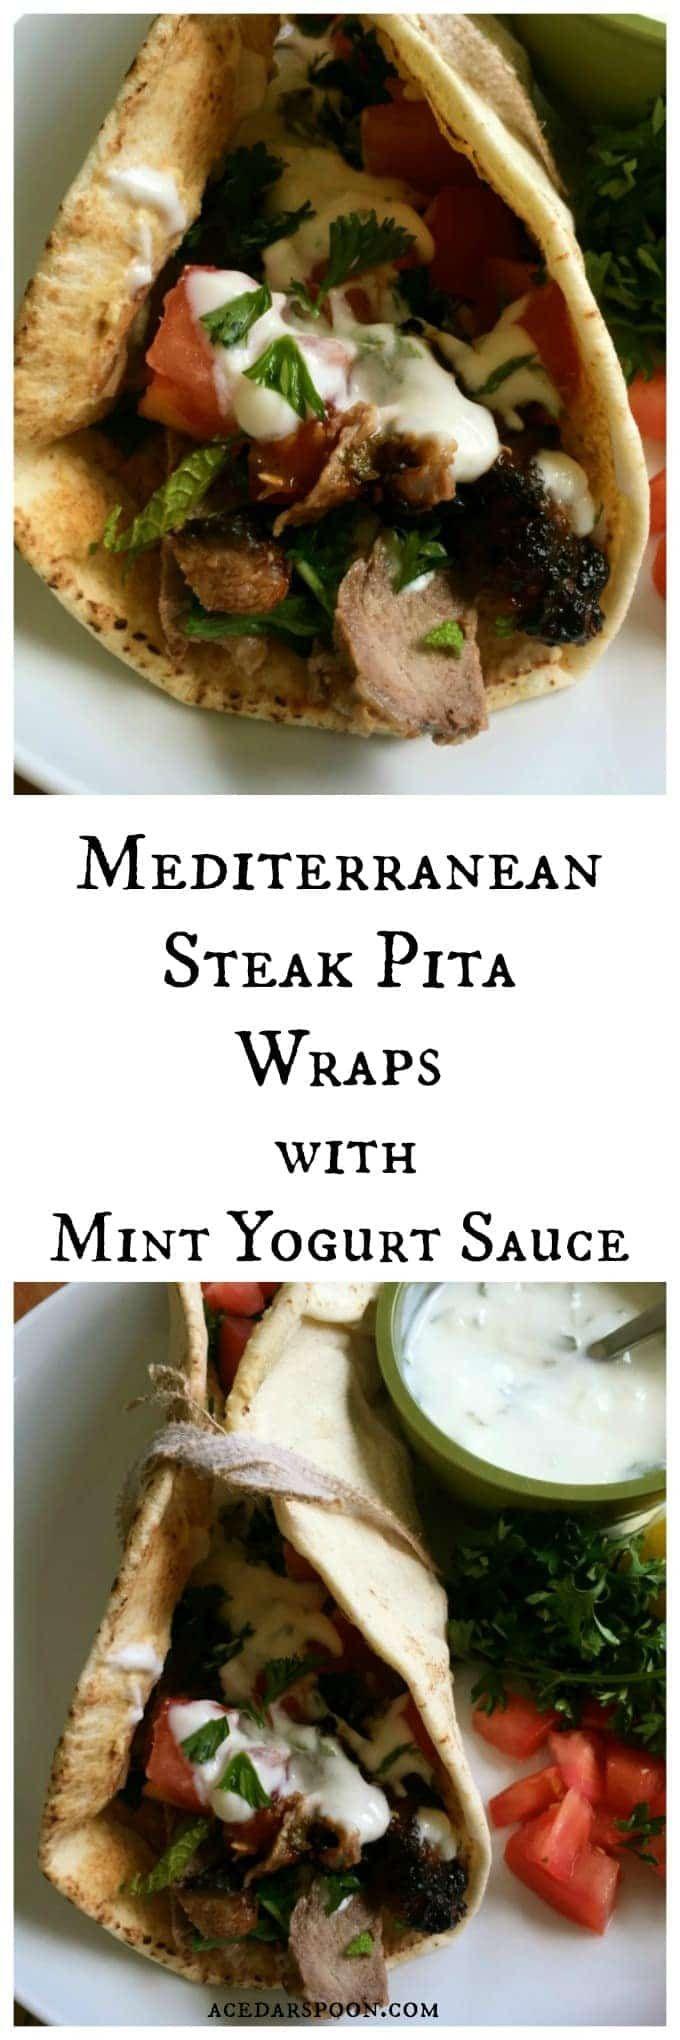 11 Healthy Lunch Wraps That Put Sandwiches to Shame | Pita wrap ...